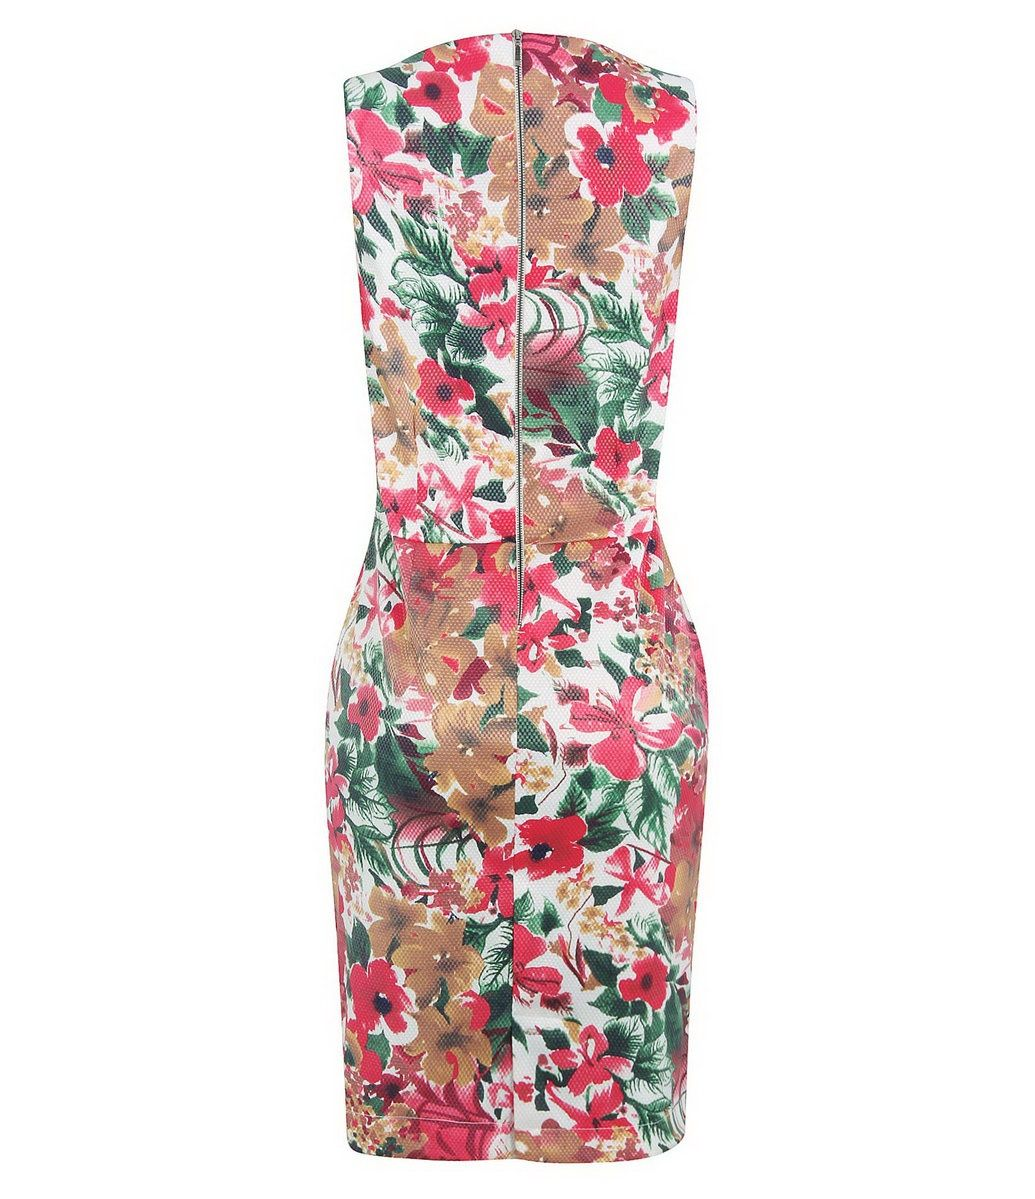 Vestido Tubinho com Estampa Floral - Costas